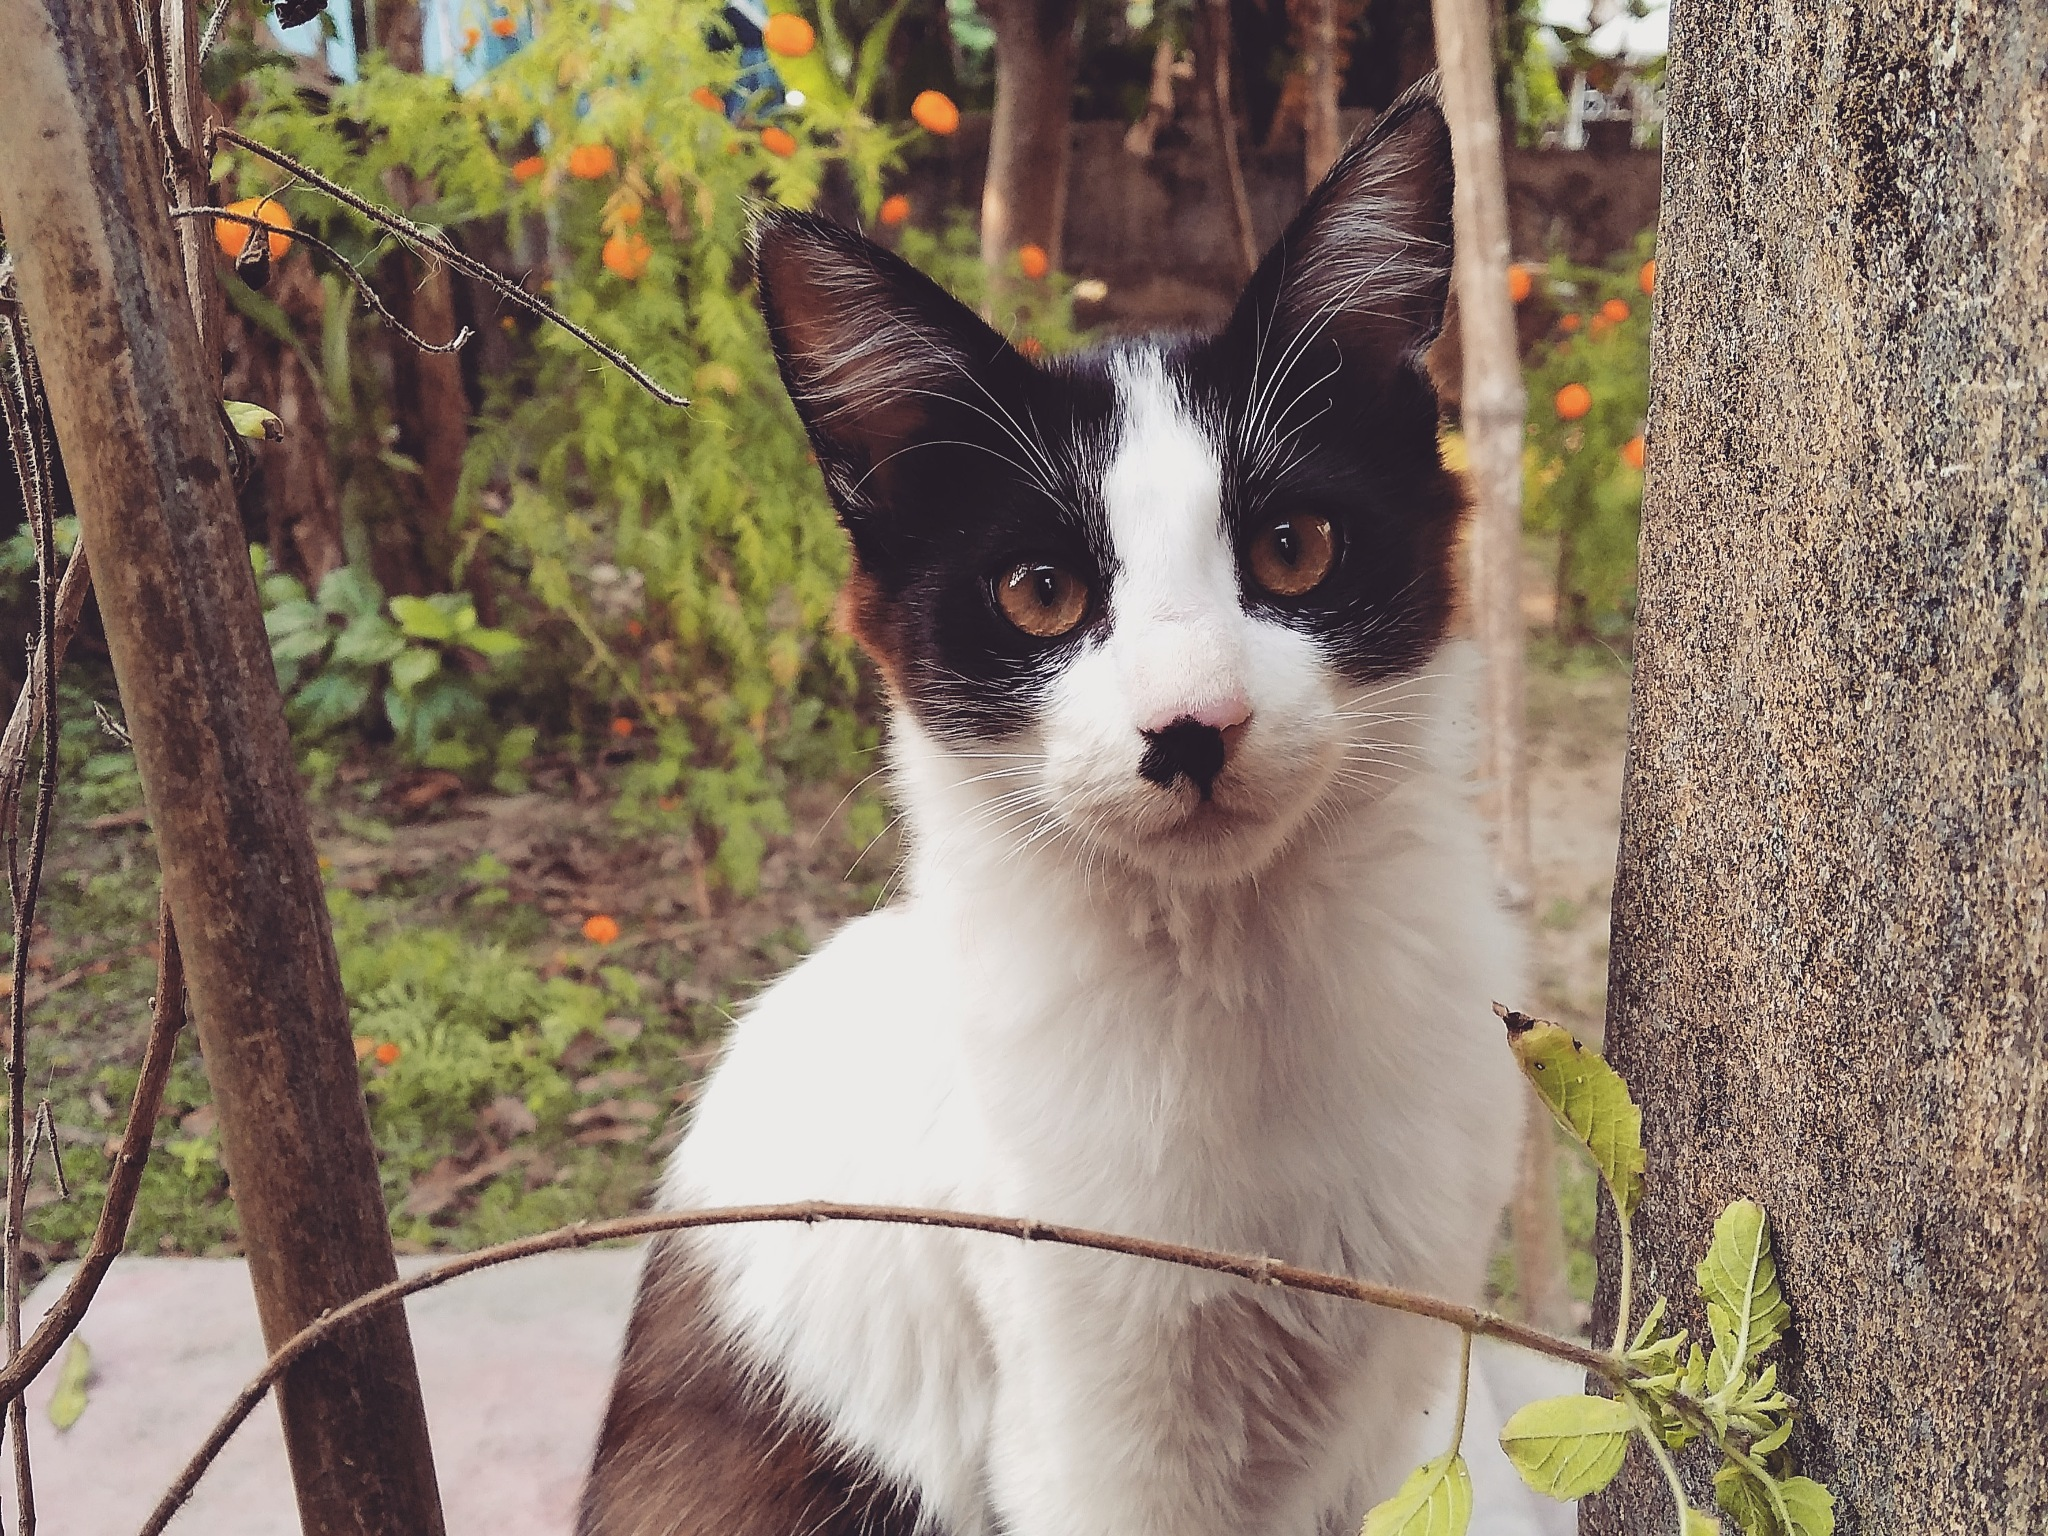 The Cat by Subhrajit Patra